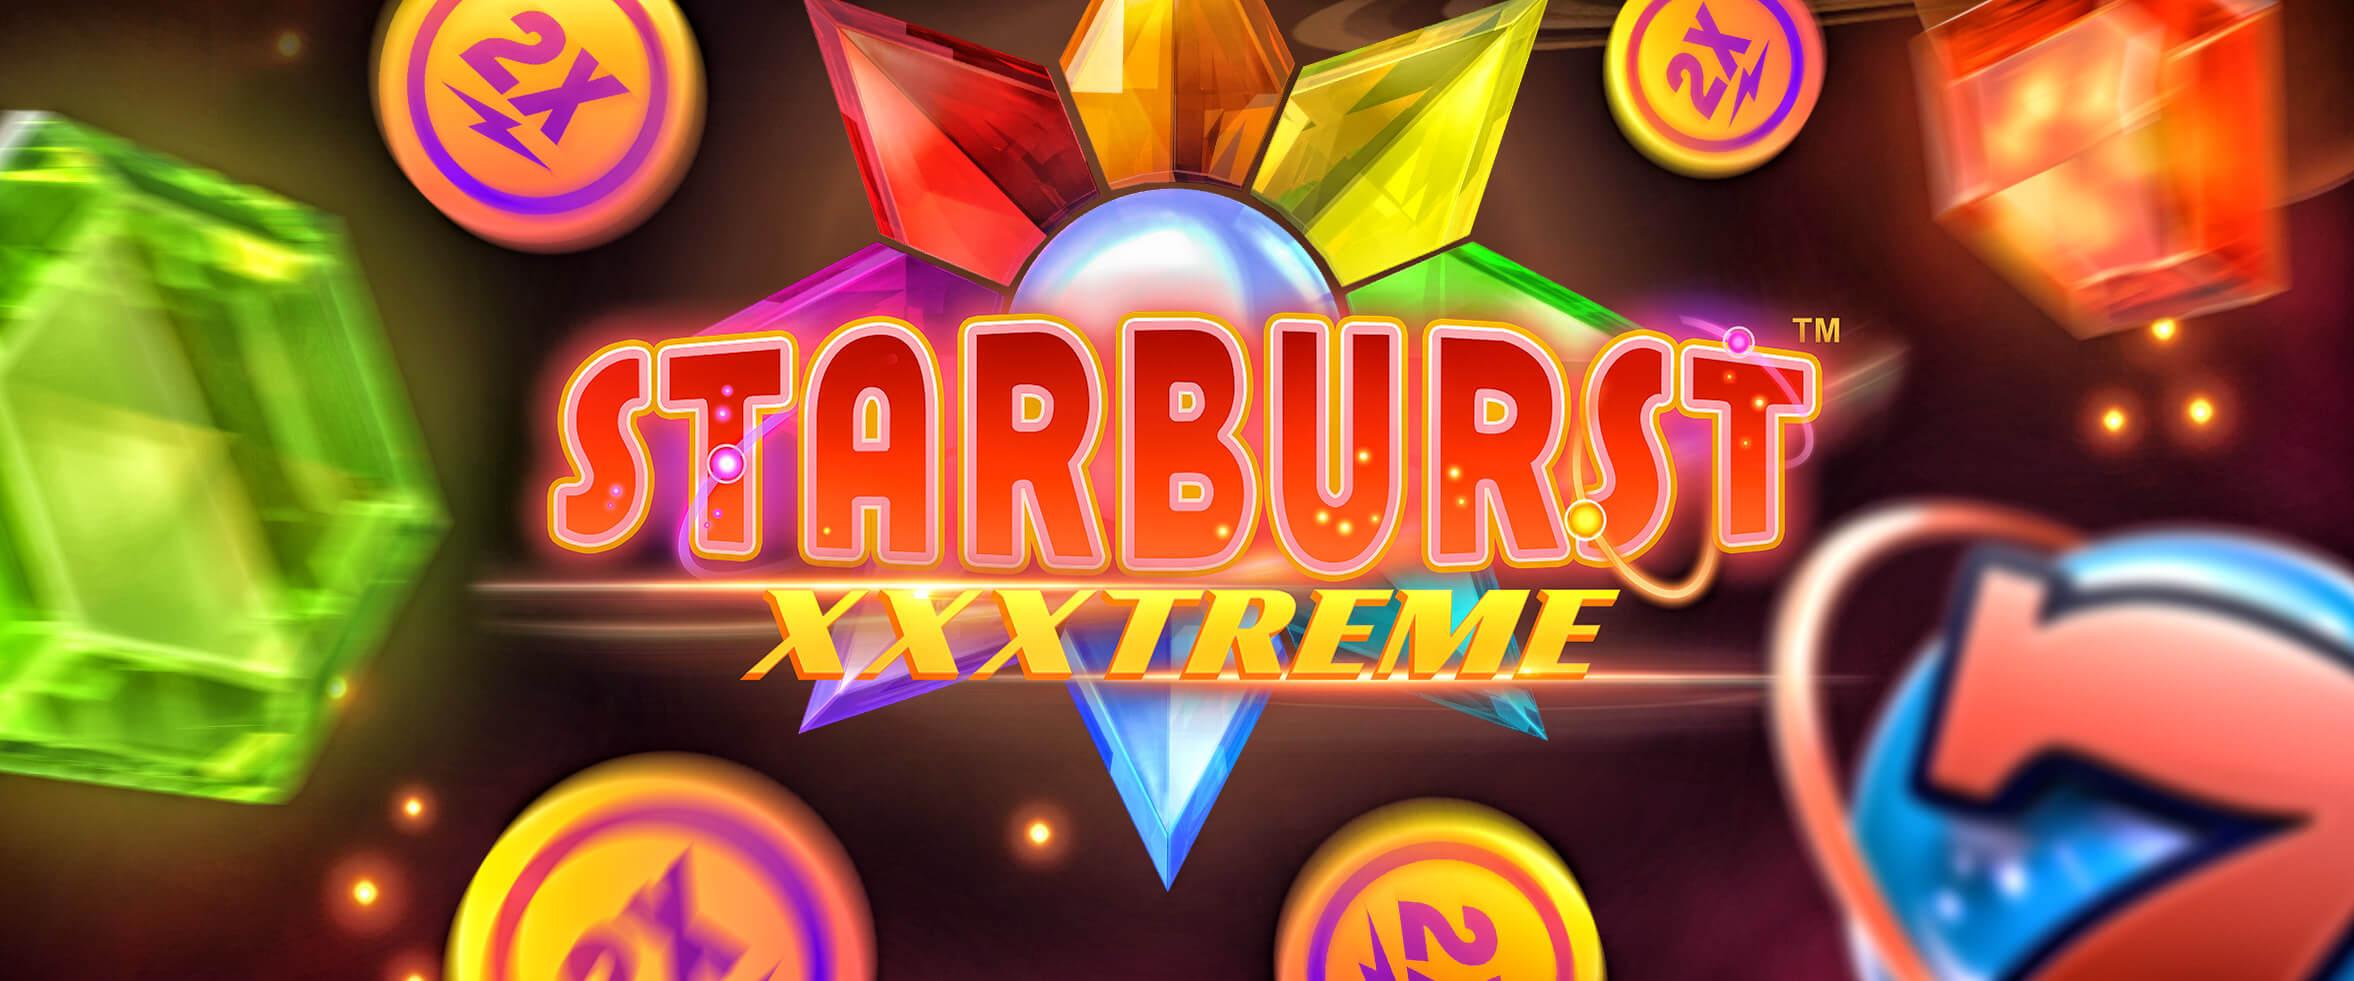 Double Speed Starburst XXXtreme -peliin